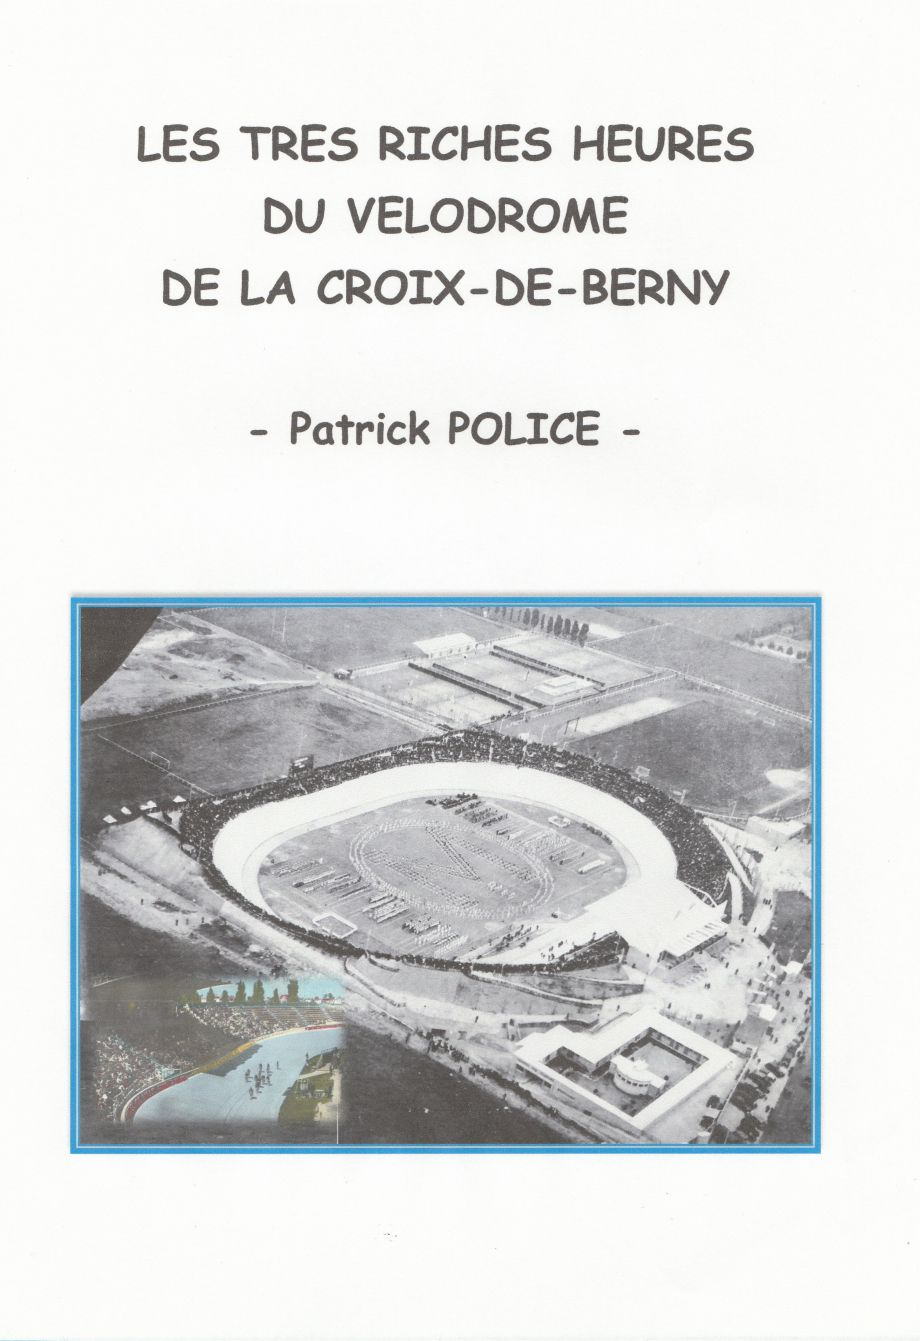 L'histoire du vélodrome de la Croix-de-Berny